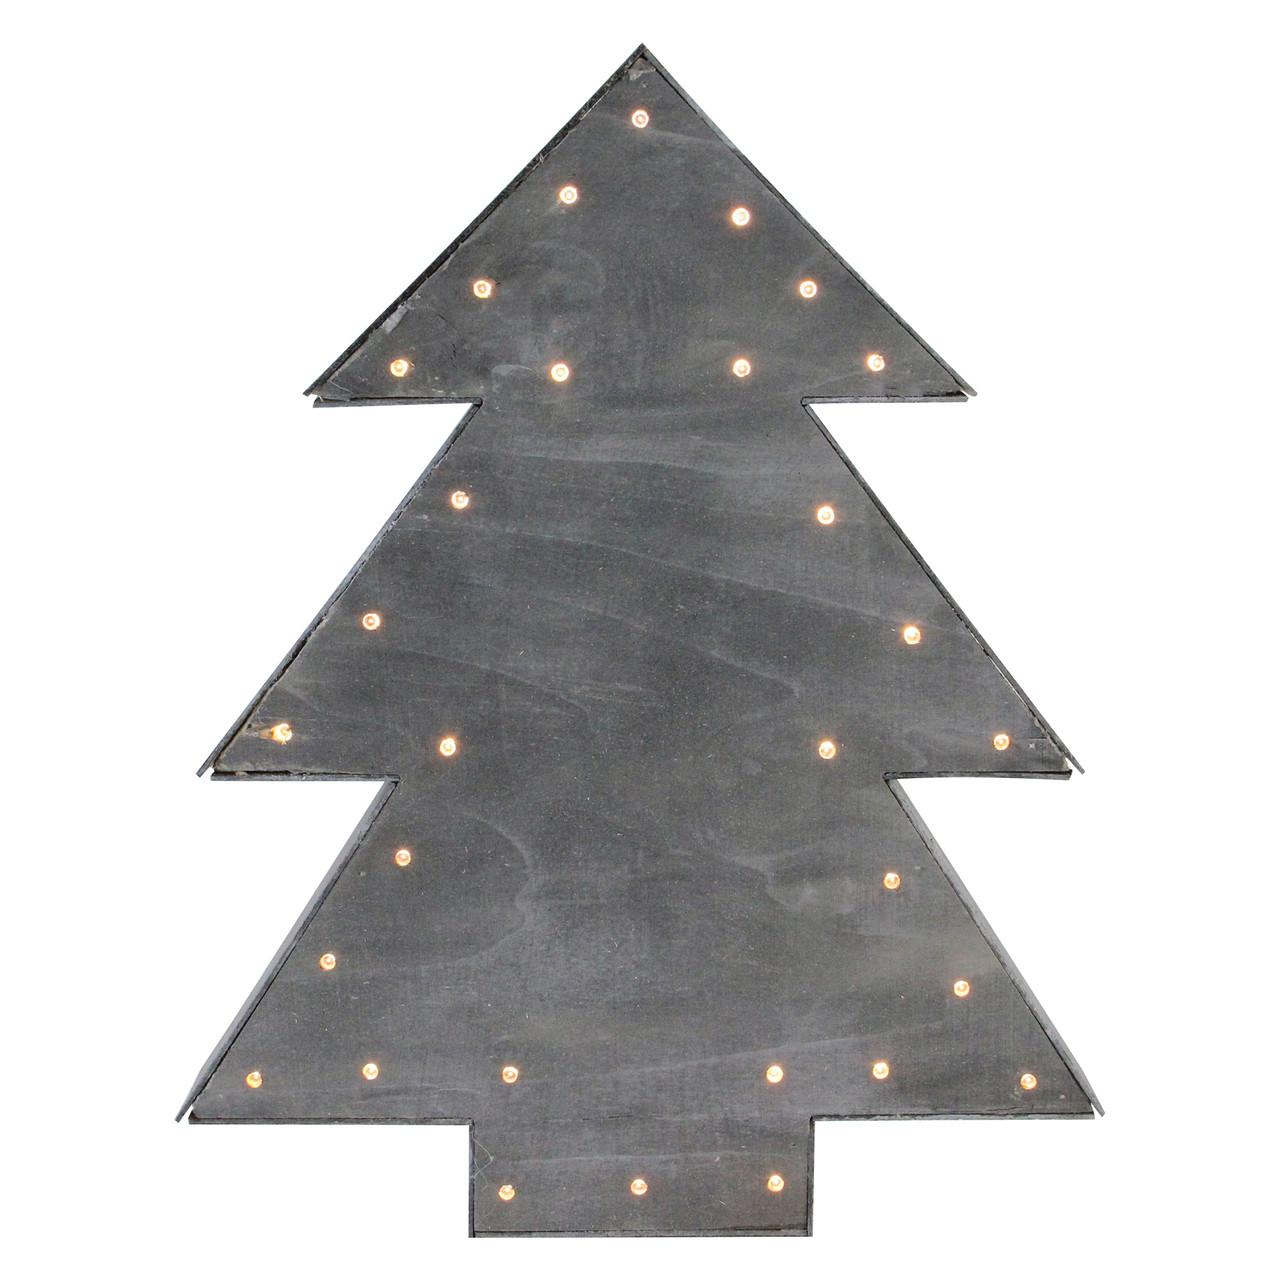 17 small lighted grey tree christmas table top decoration 32621849 - Small Lighted Christmas Trees